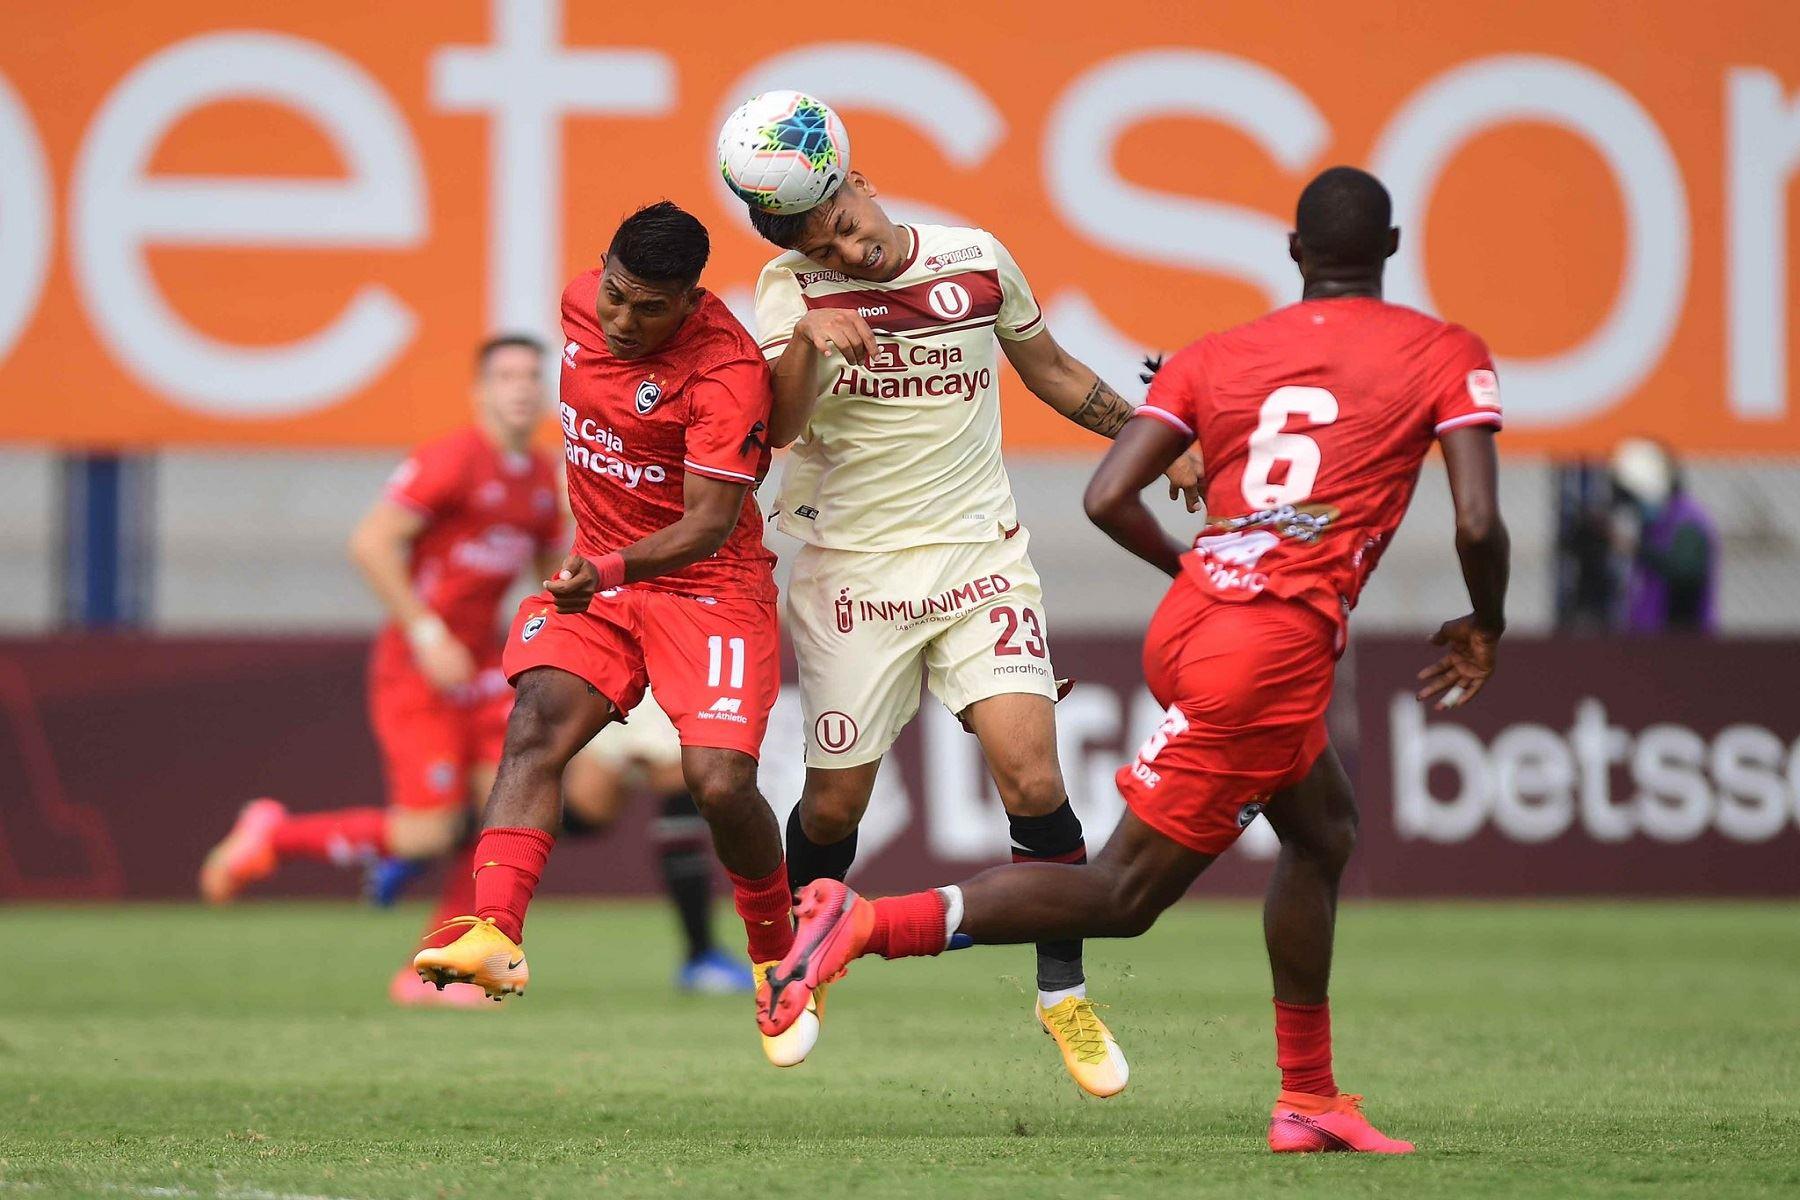 Liga 1 Betsson.